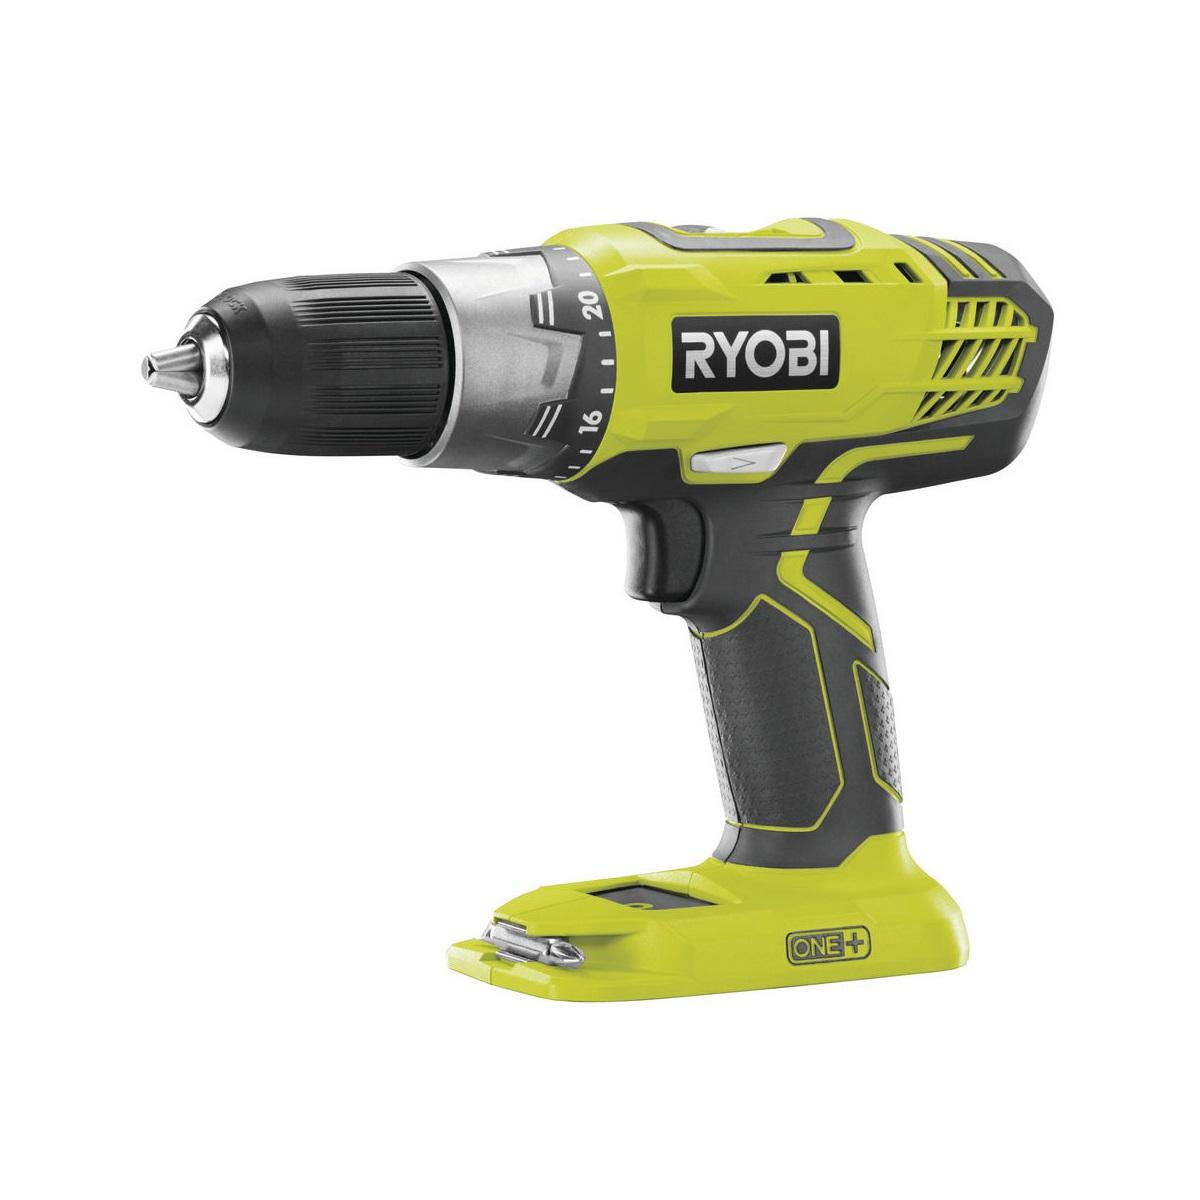 Ryobi R18DDP2-0aku 18 V vrtačka/šroubovák ONE+(bez baterie a nabíječky)